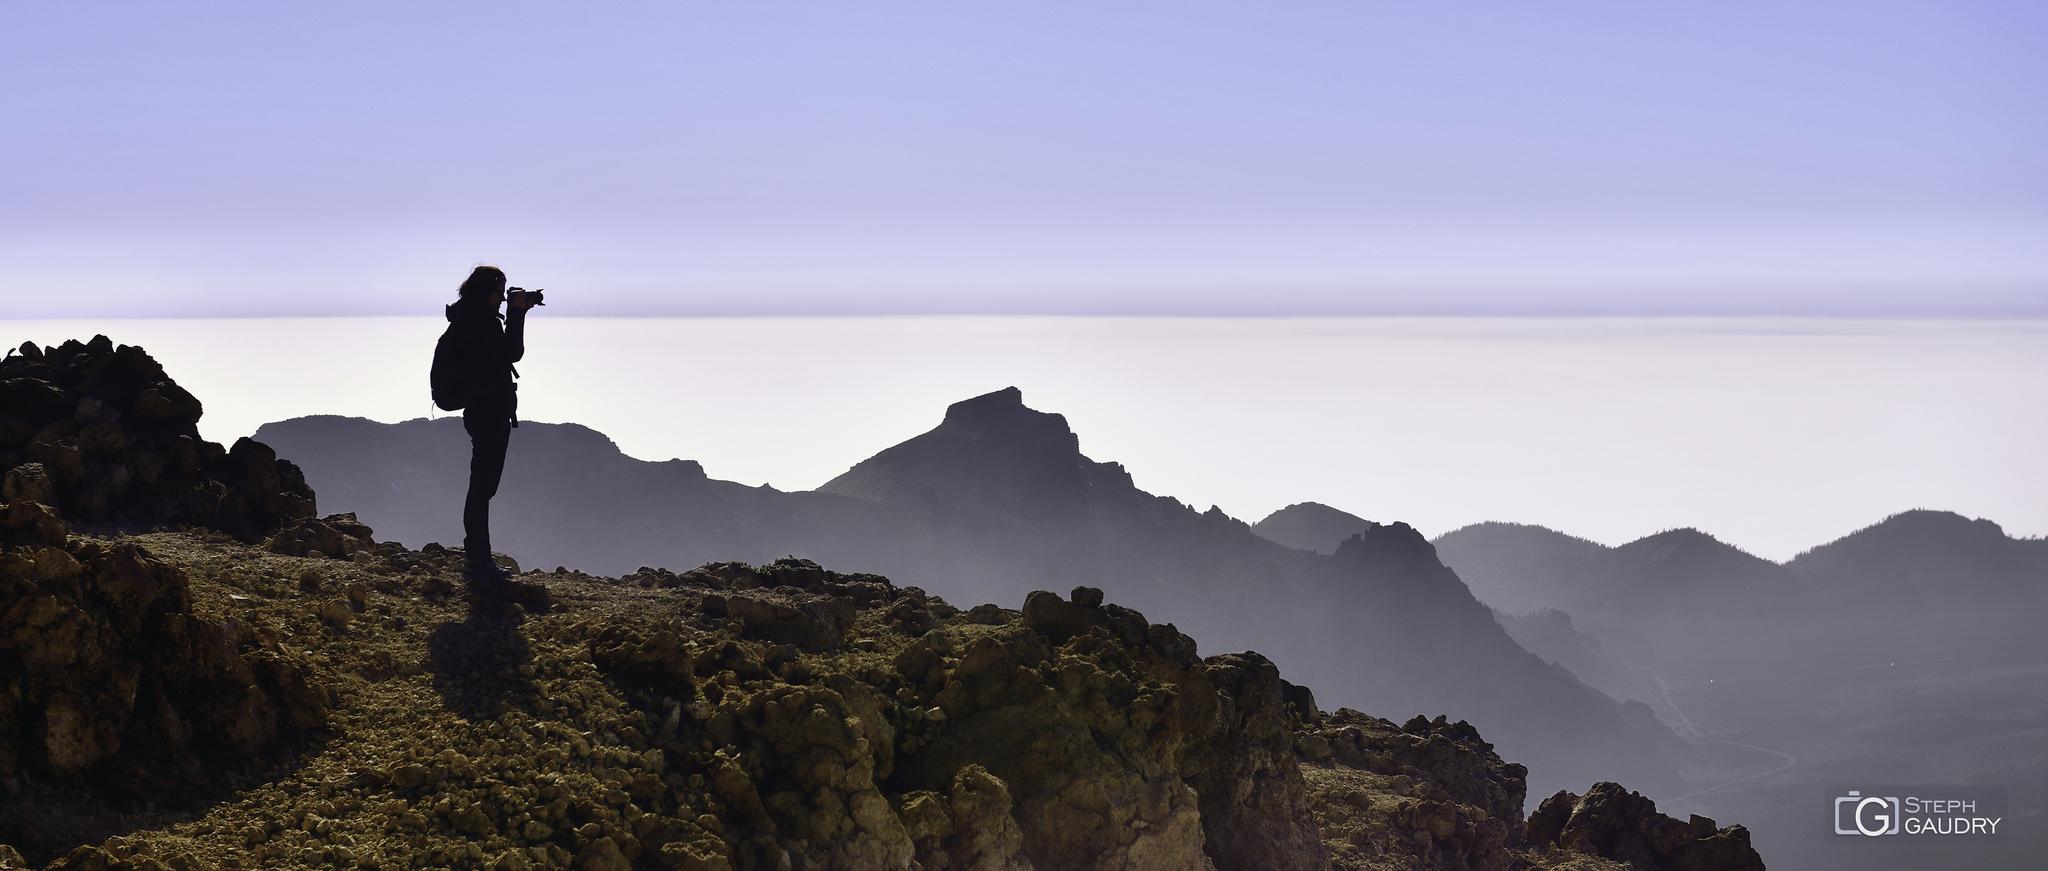 Sombra en el Alto de Guajara [Klik om de diavoorstelling te starten]